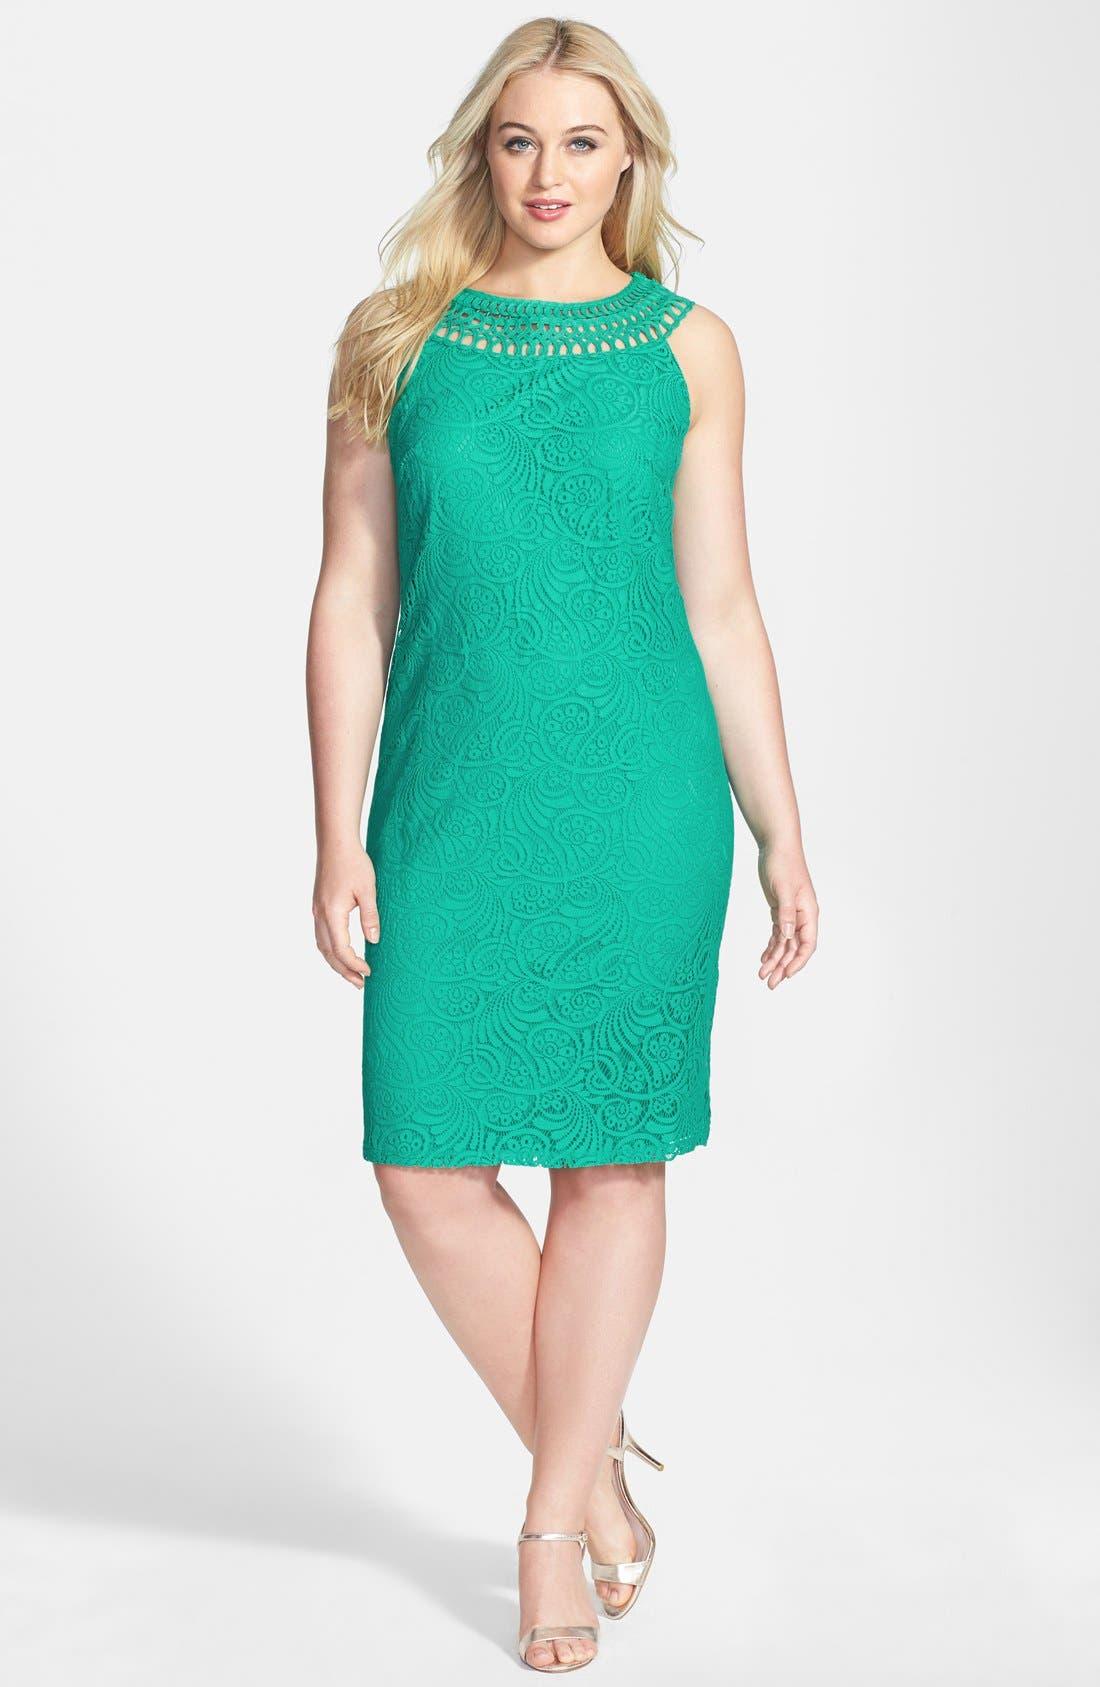 Alternate Image 1 Selected - Jessica Howard Soutache Neck Lace Sheath Dress (Plus Size)